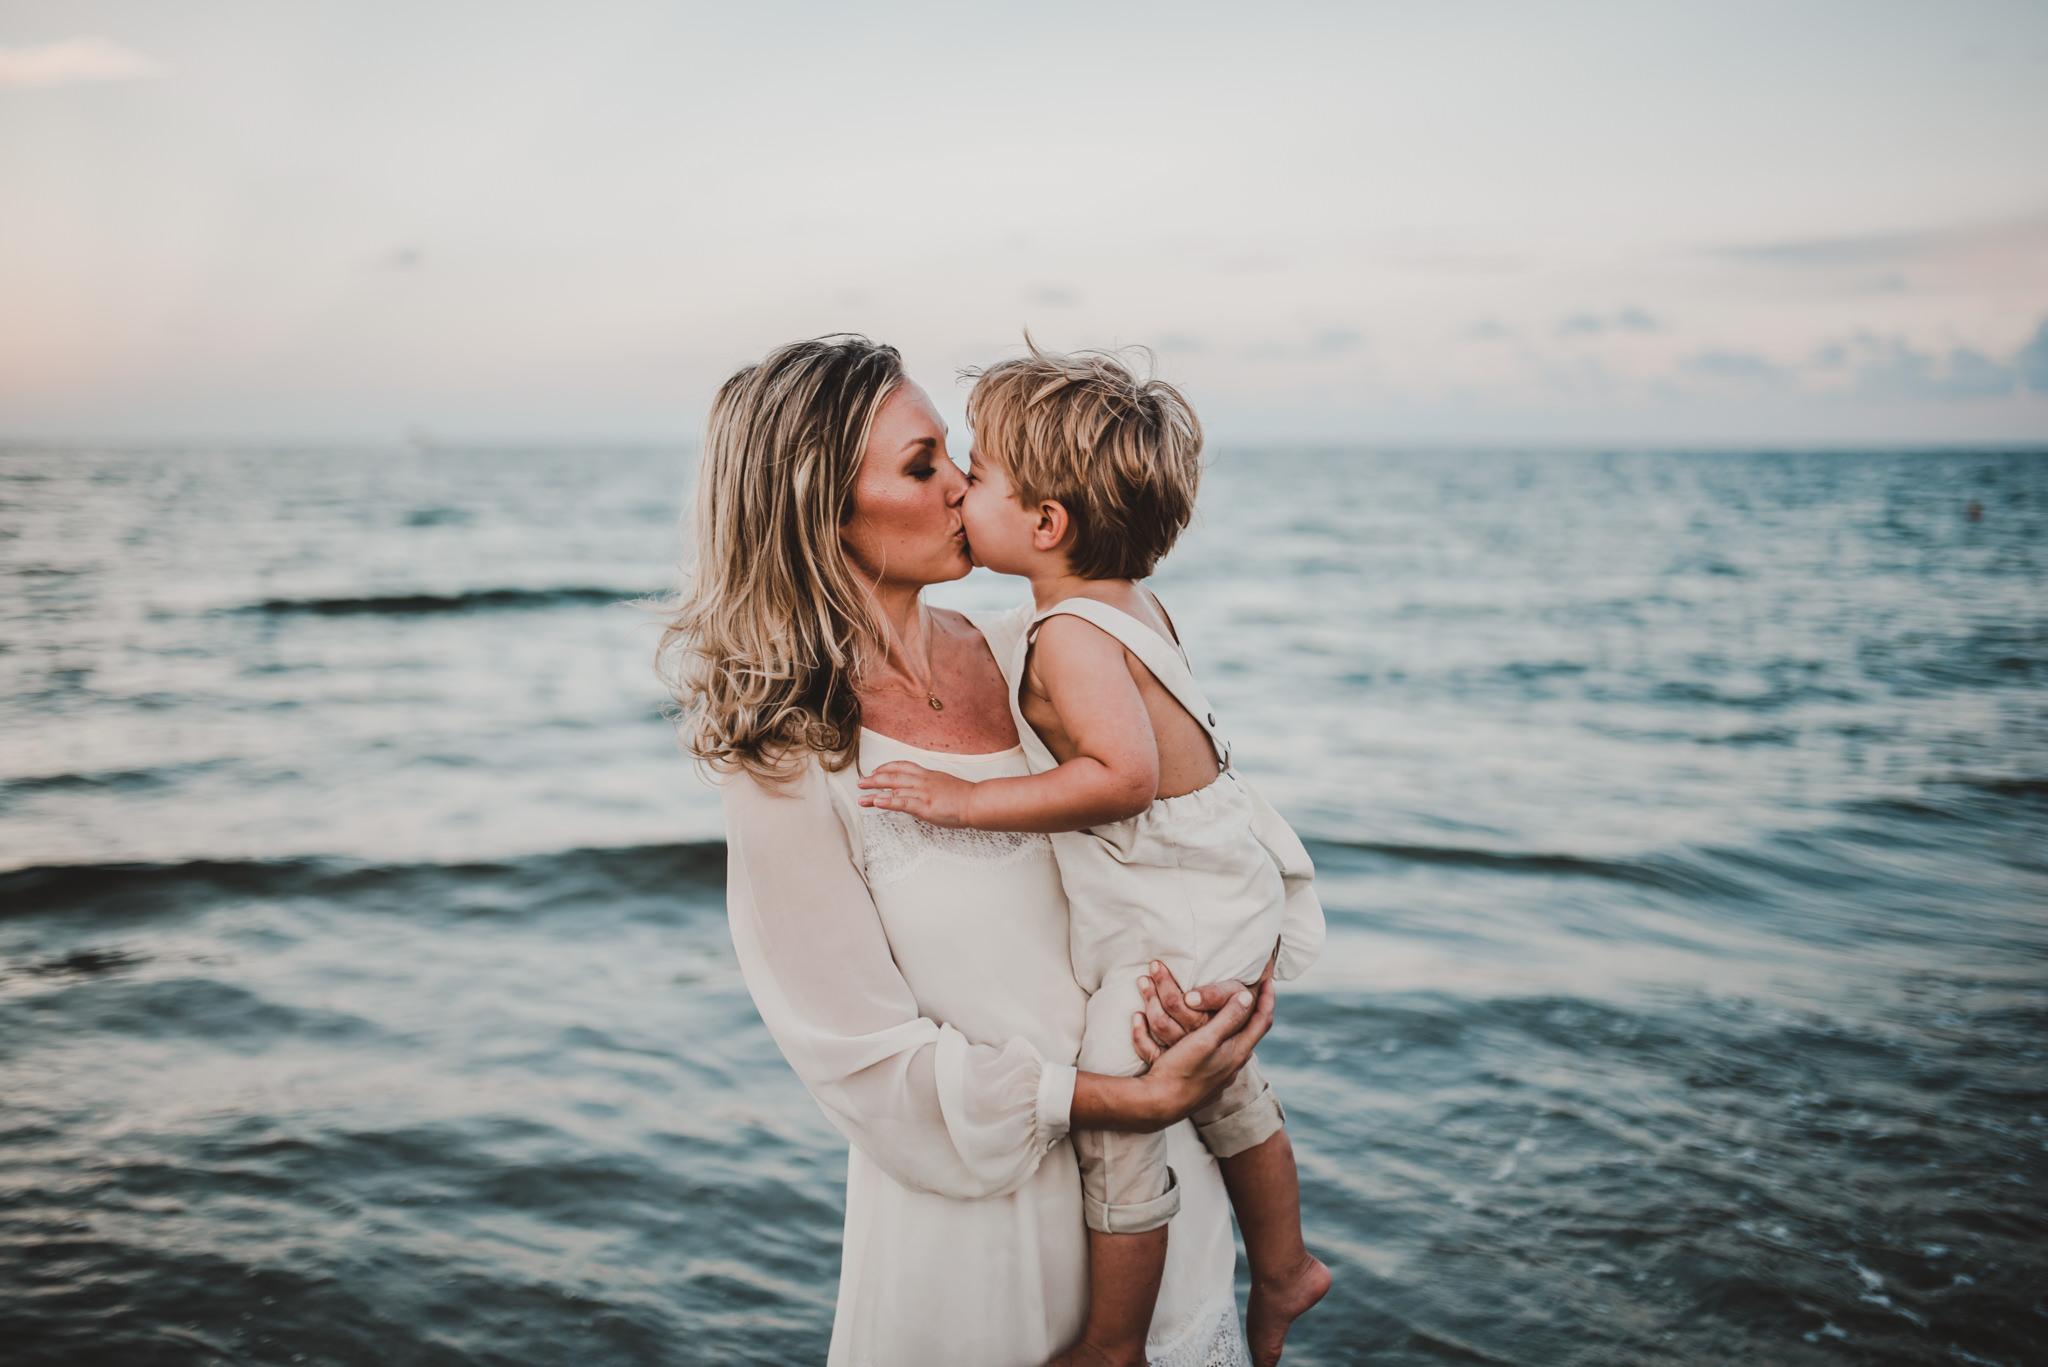 twyla jones photography - treasure coast florida - mother son at the beach--39.jpg